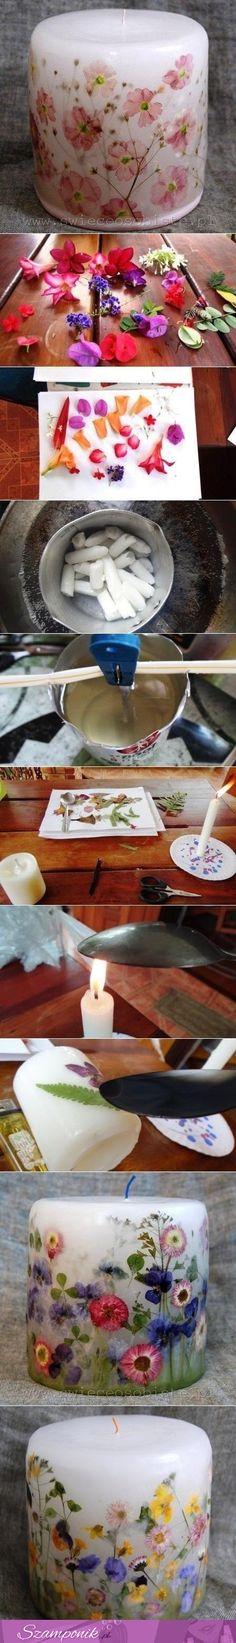 kerzen kerzen set rosa ein designerst ck von fahthai miracle candle bei dawanda zr b to. Black Bedroom Furniture Sets. Home Design Ideas